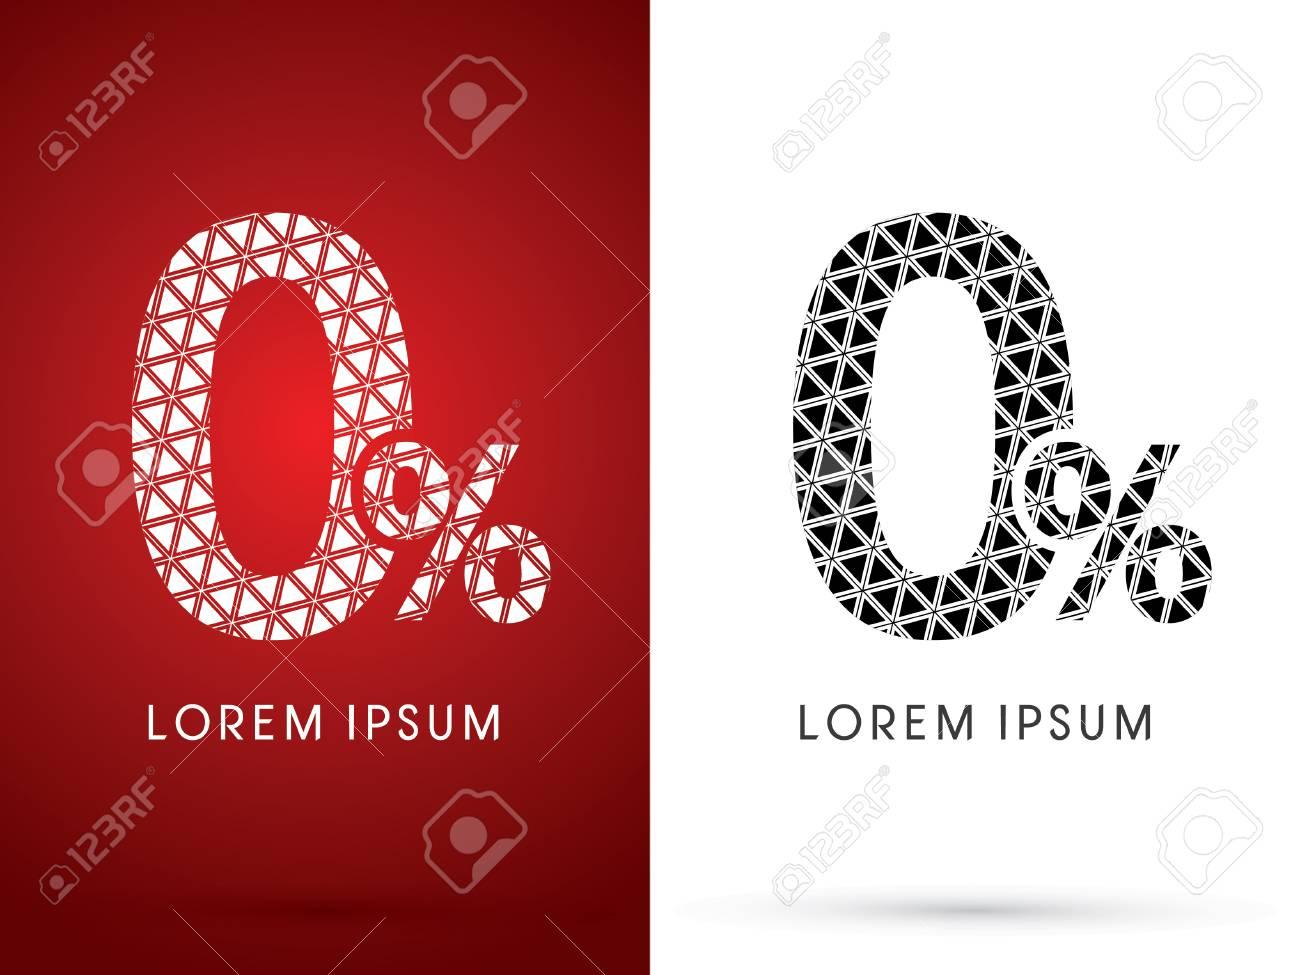 0 Zero Percent Modern Font Designed Using White And Black Triangle Geometric Shape